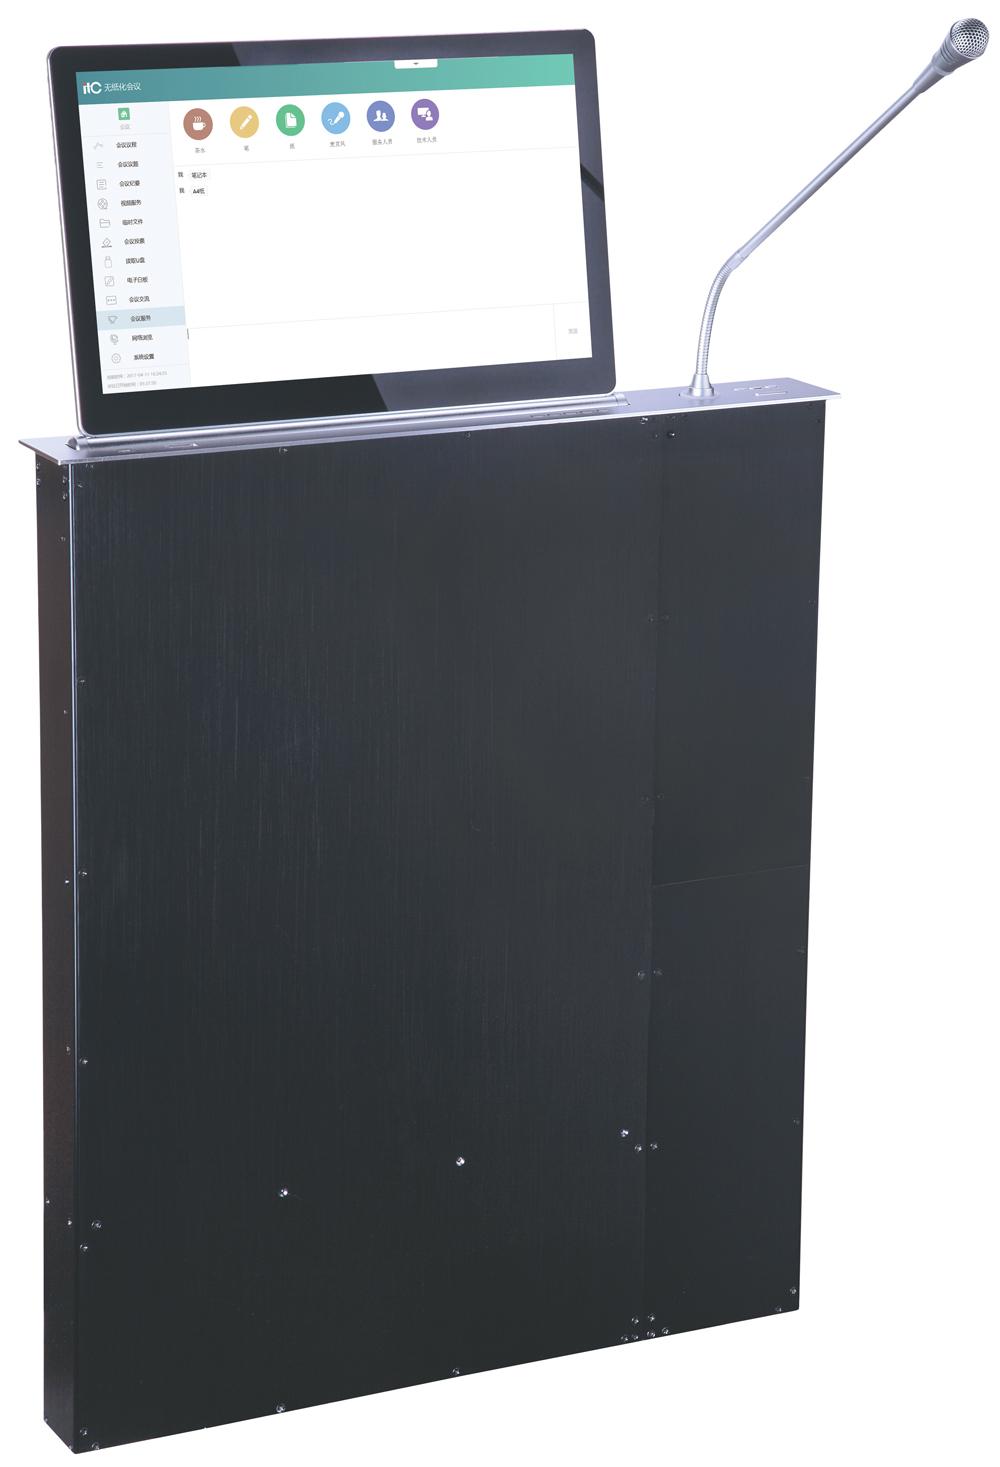 ITC-TS-F173MT 无纸化升降器